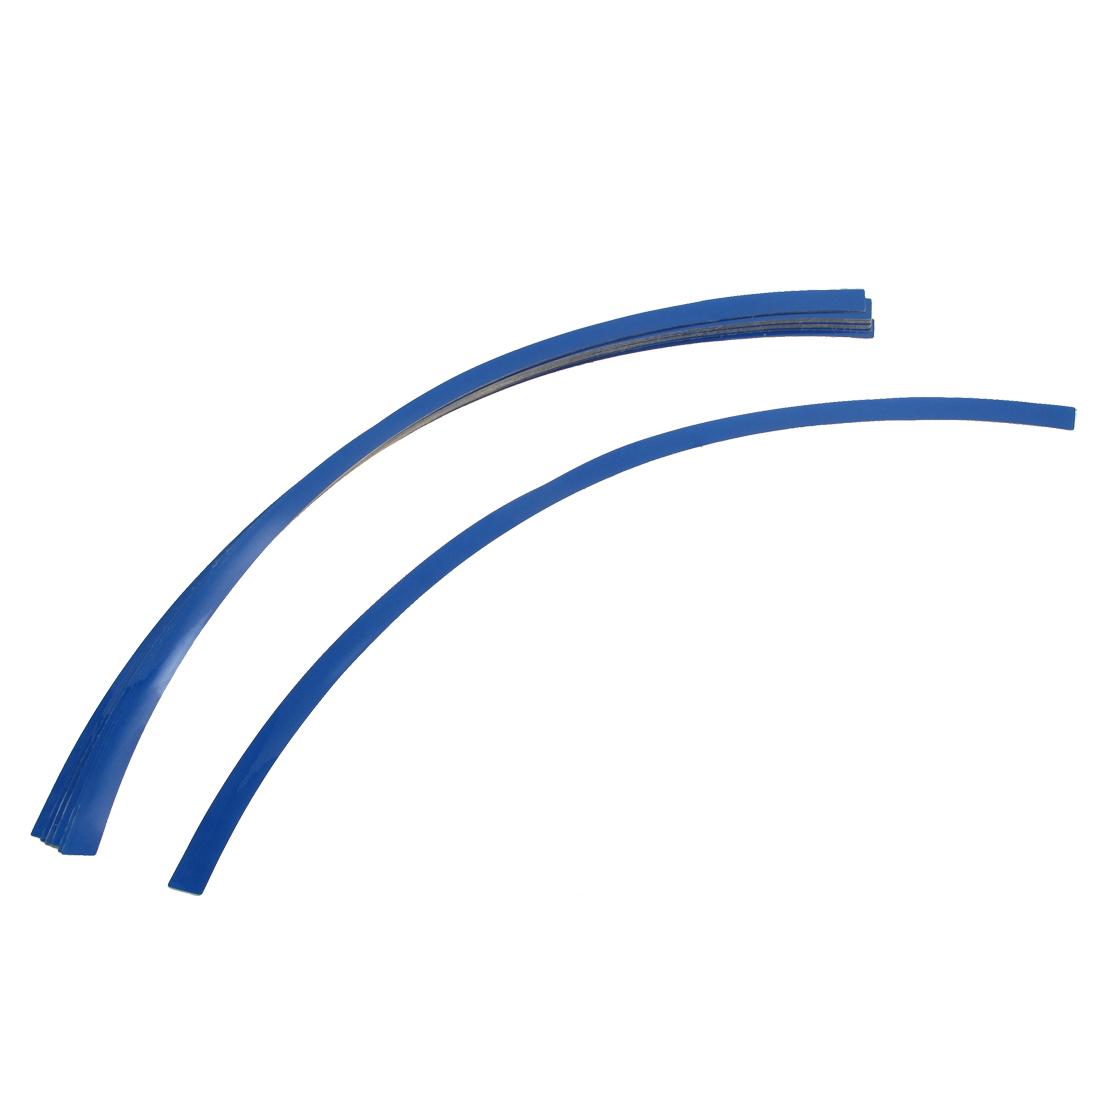 Motorcycle Car Tire Rim Stripe Tape Wheel Decorative Decal Sticker Blue 16pcs